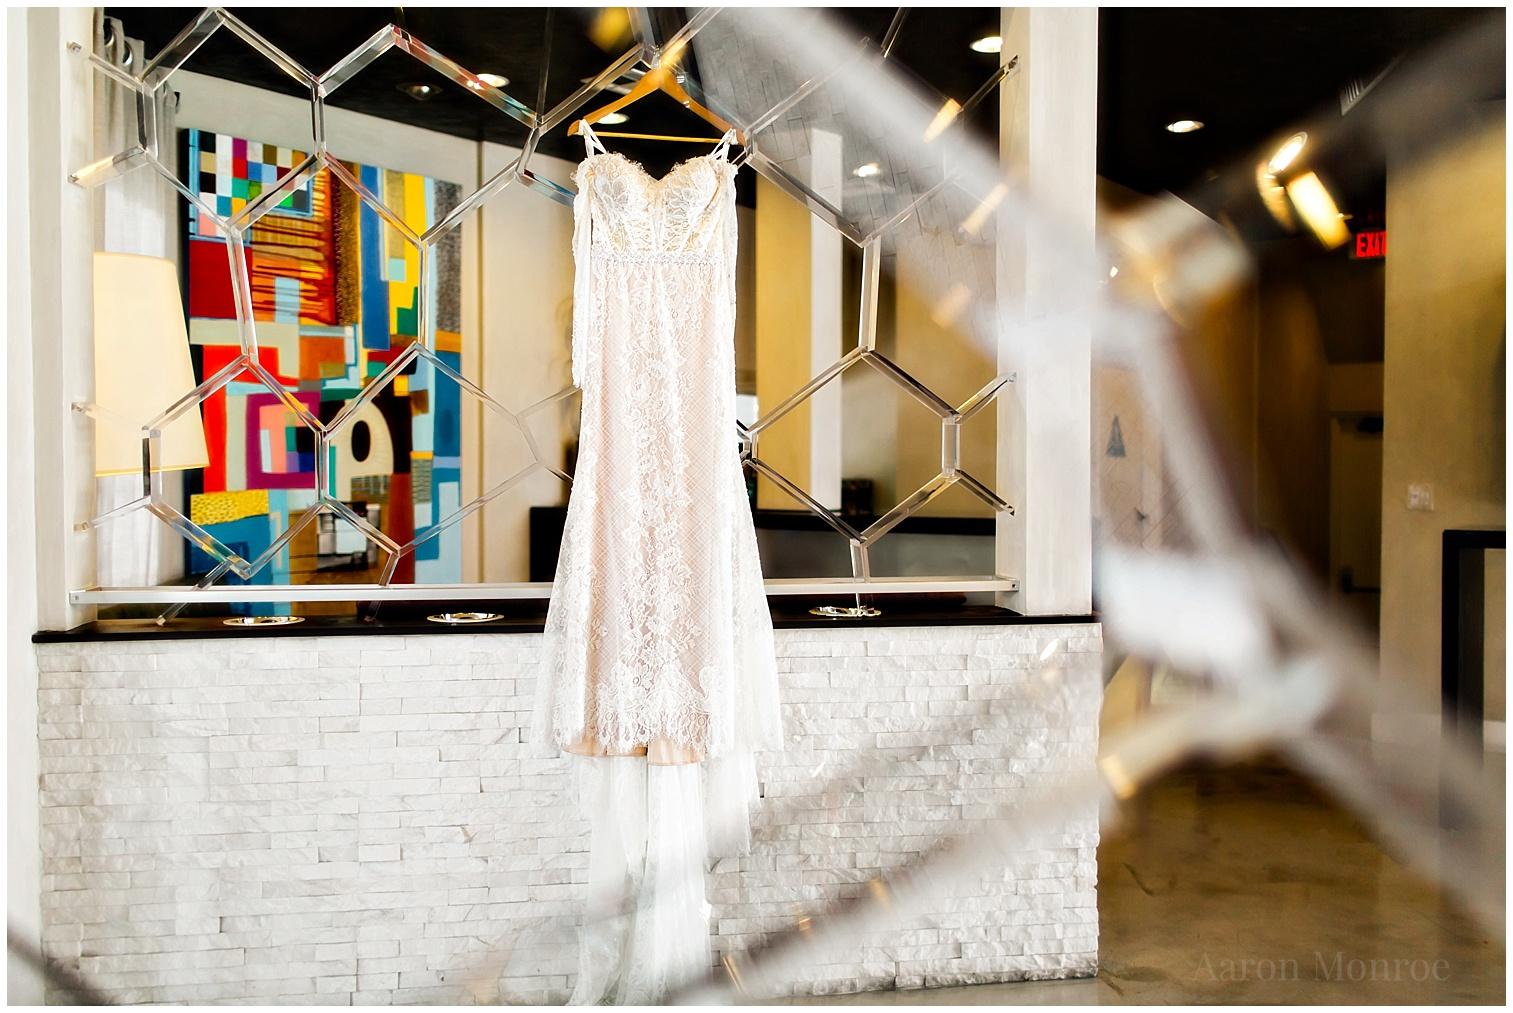 Queen_Mary_Long_Beach_Wedding_Photography_0422.jpg